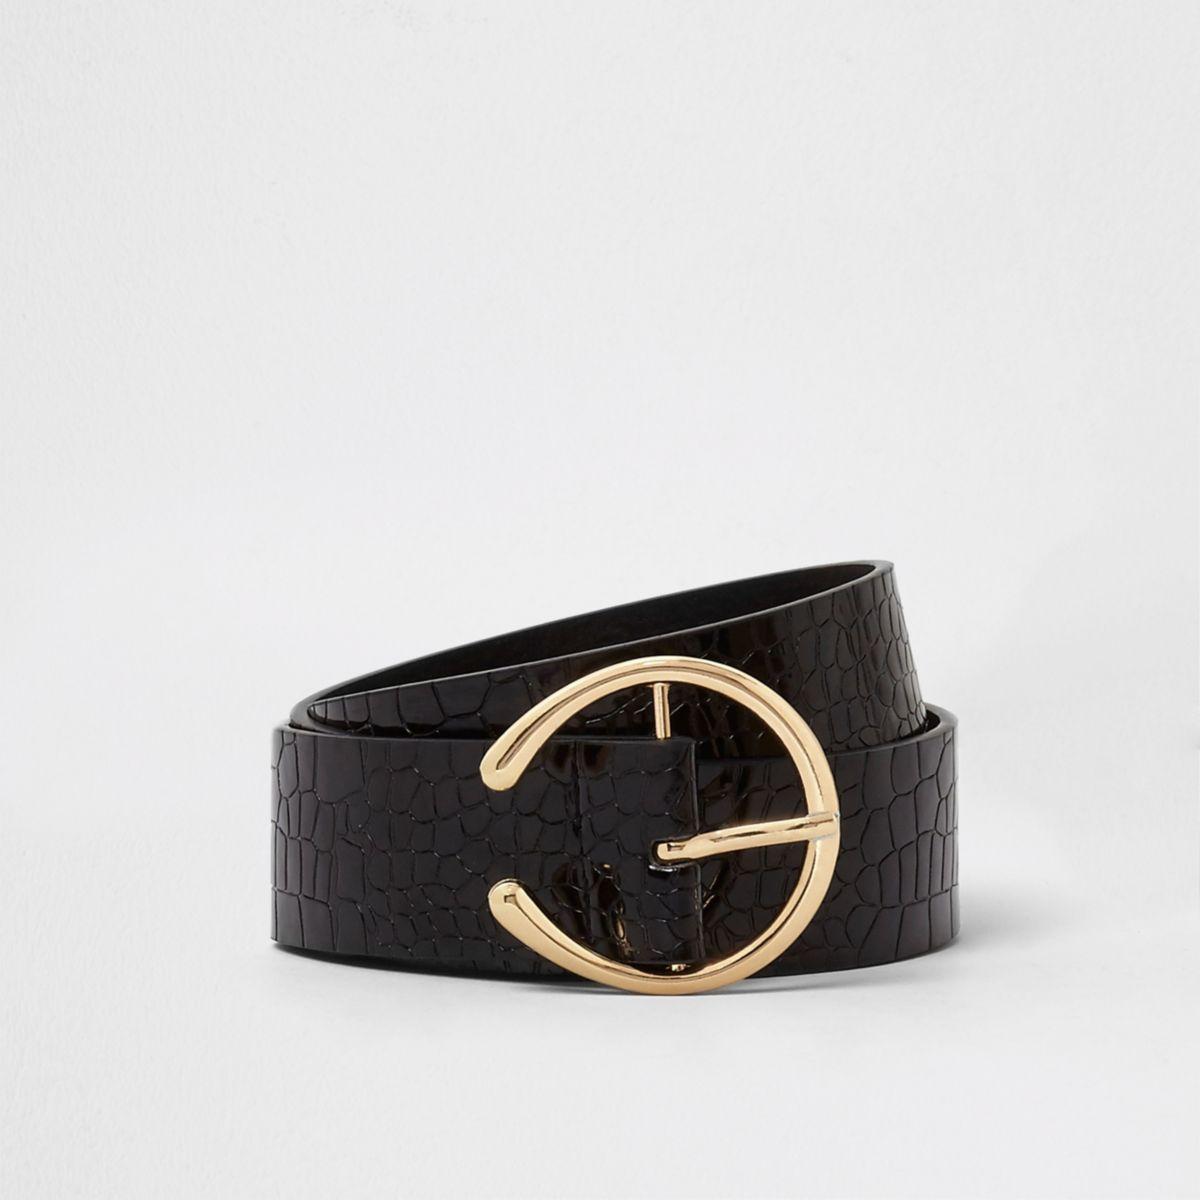 Black croc embossed horseshoe buckle belt